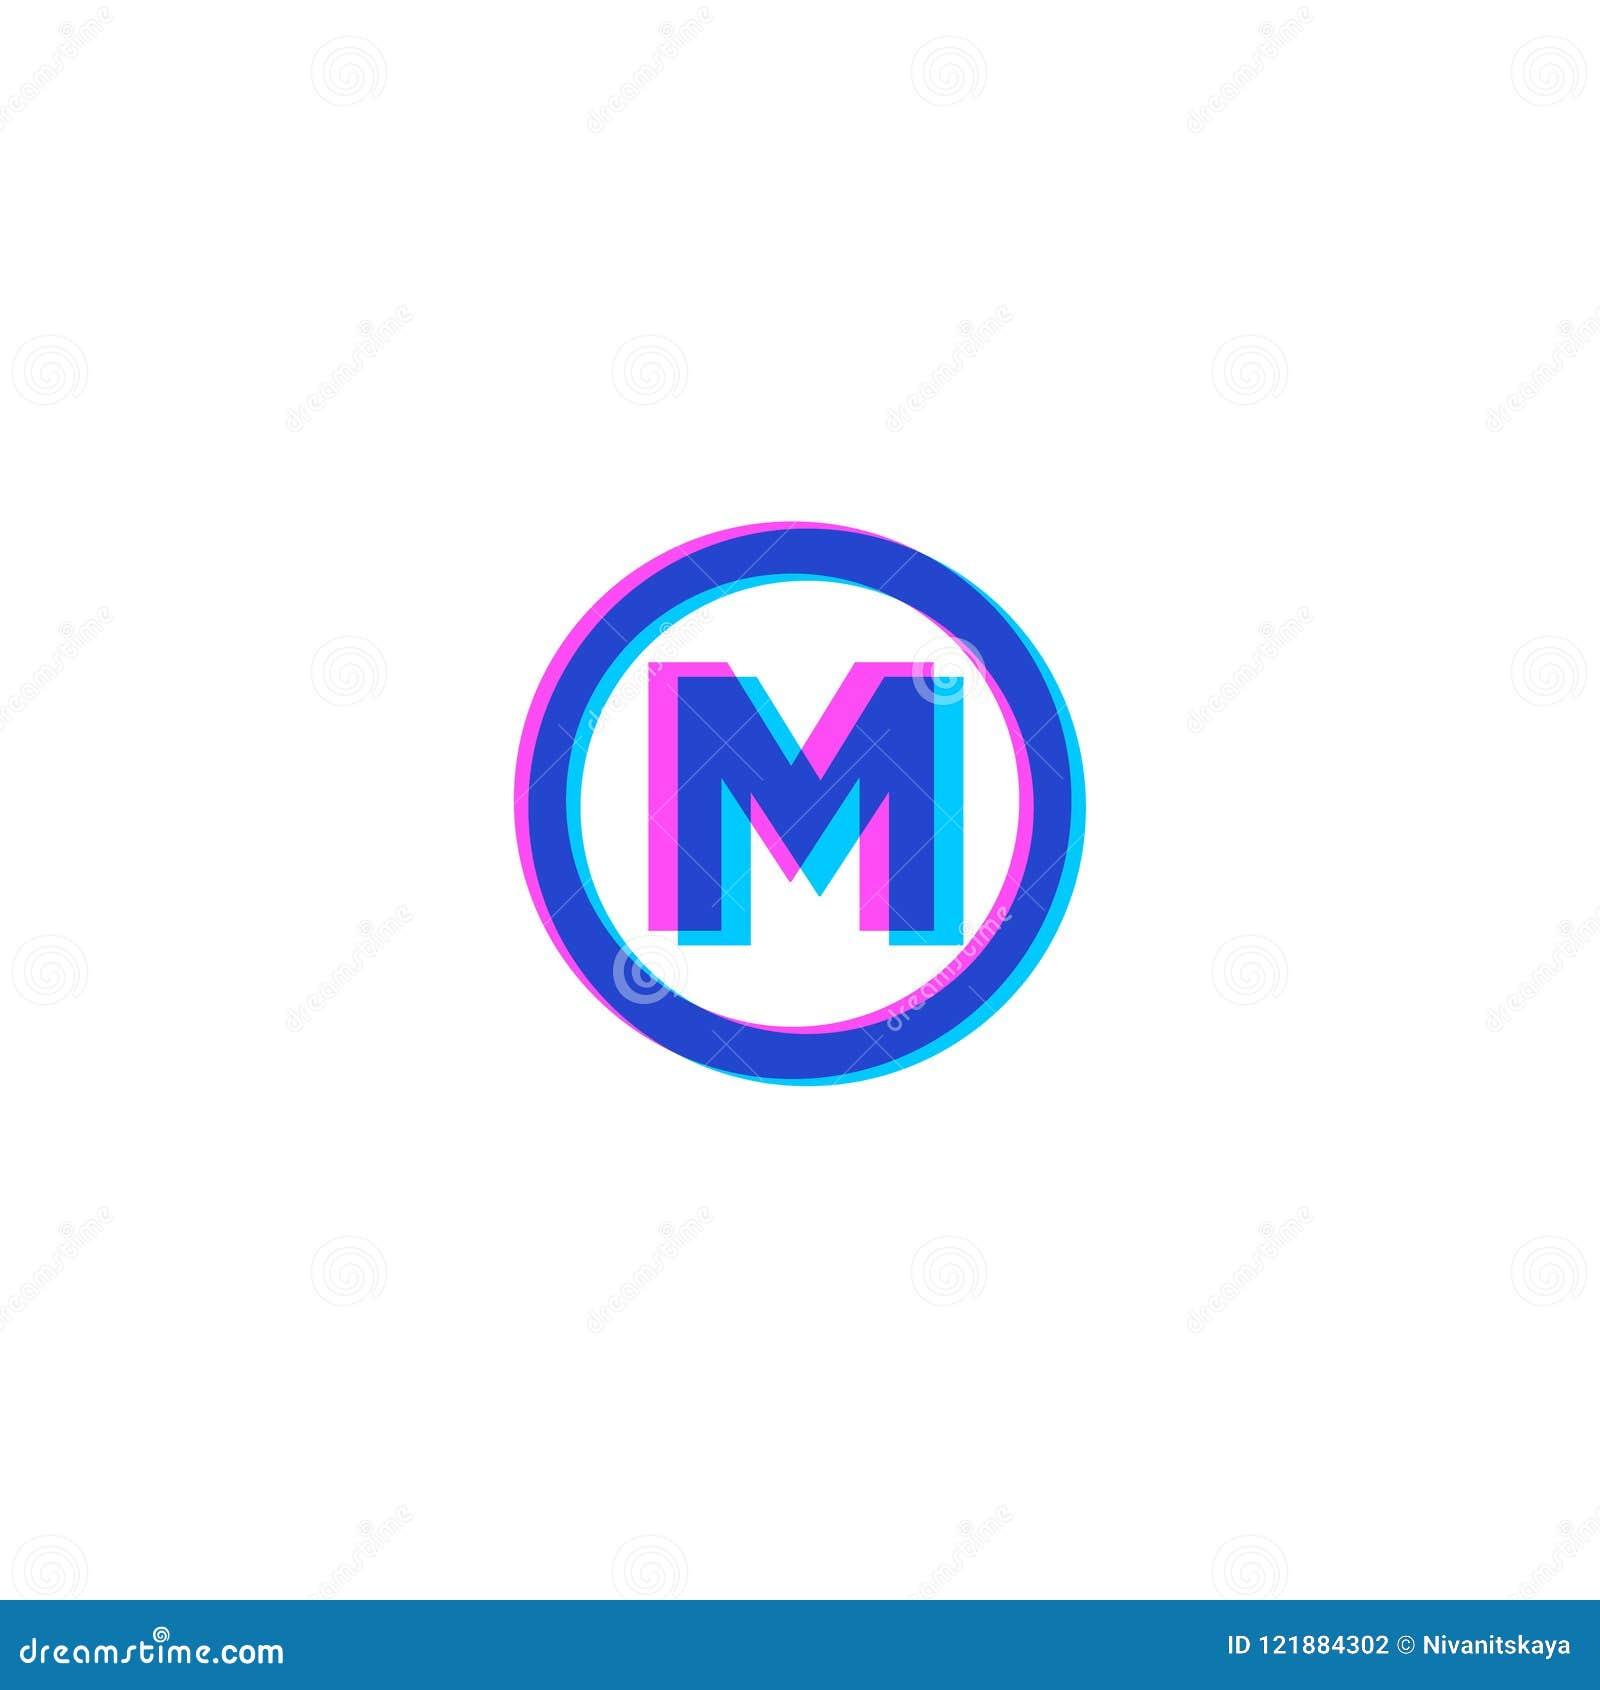 M Letter M Flat Monogram Stereo Monogram In The Circle